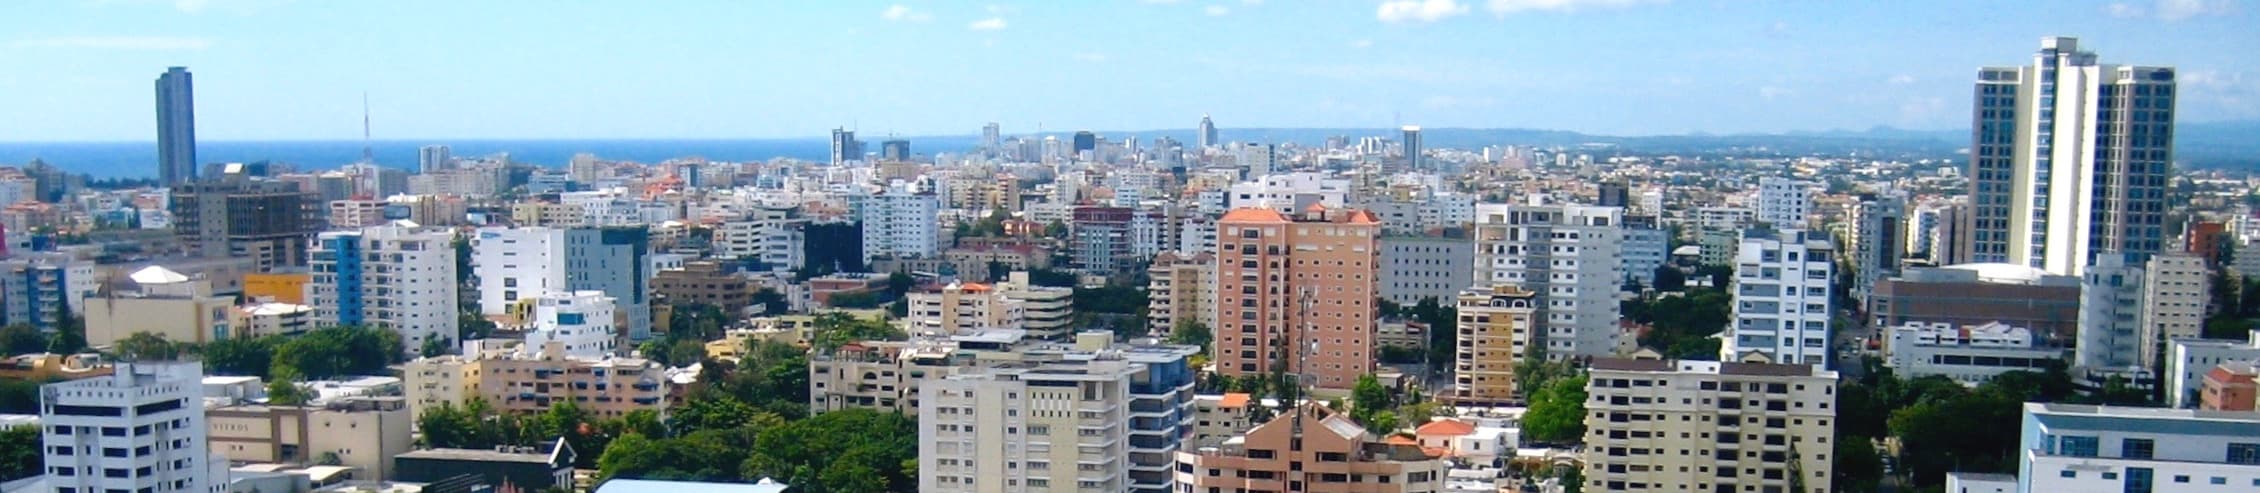 Quality of life in Santo Domingo, Dominican Republic